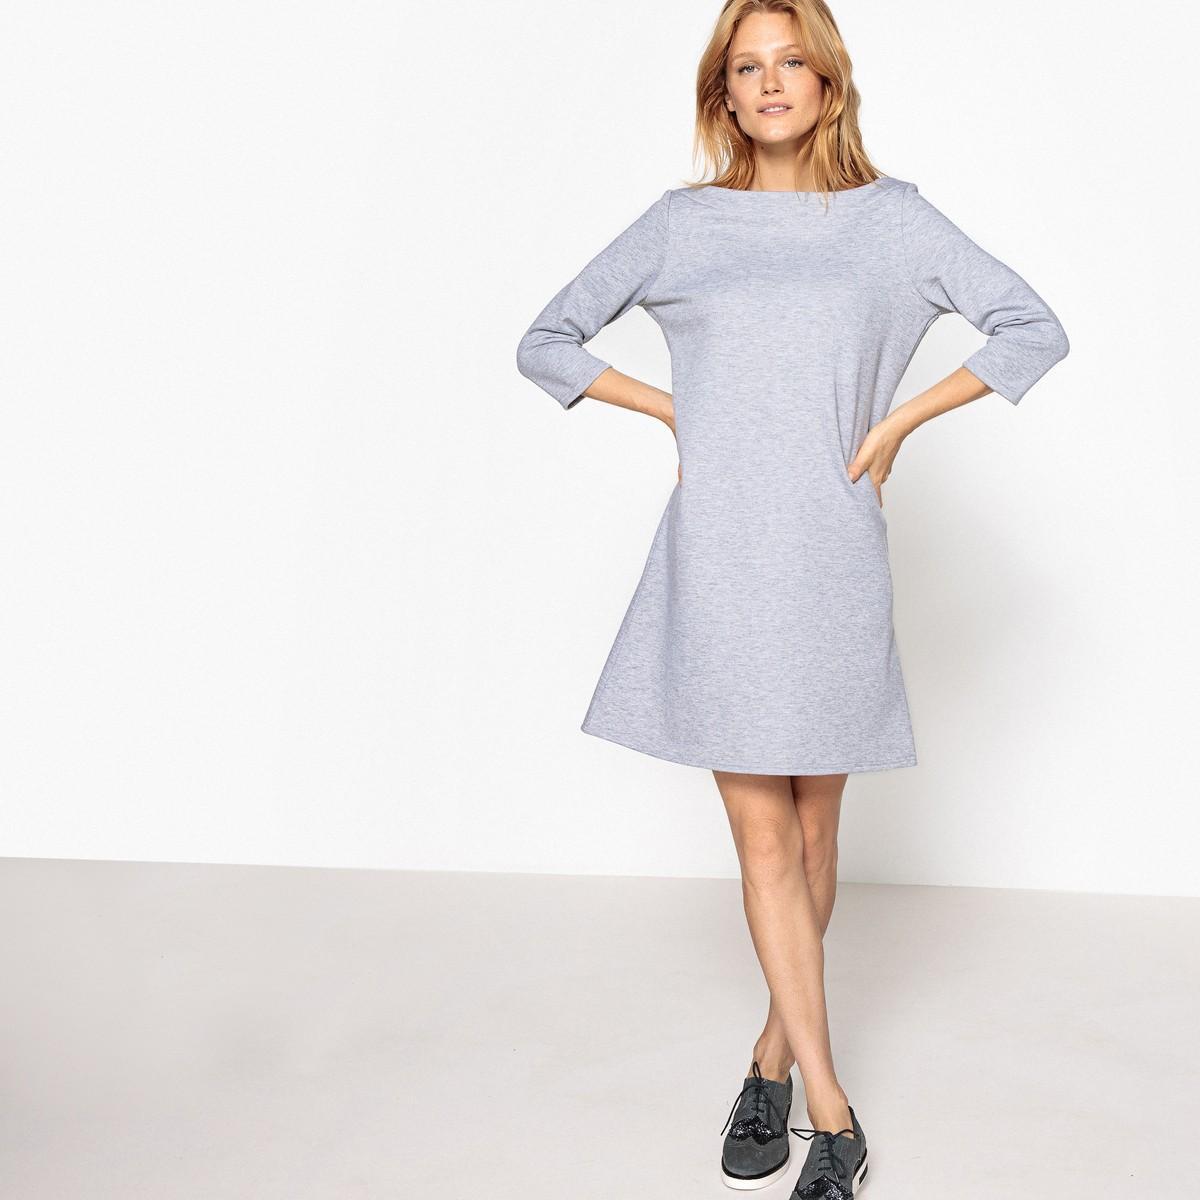 La redoute robe longueur genou manches longues lyst for Robe longueur genou